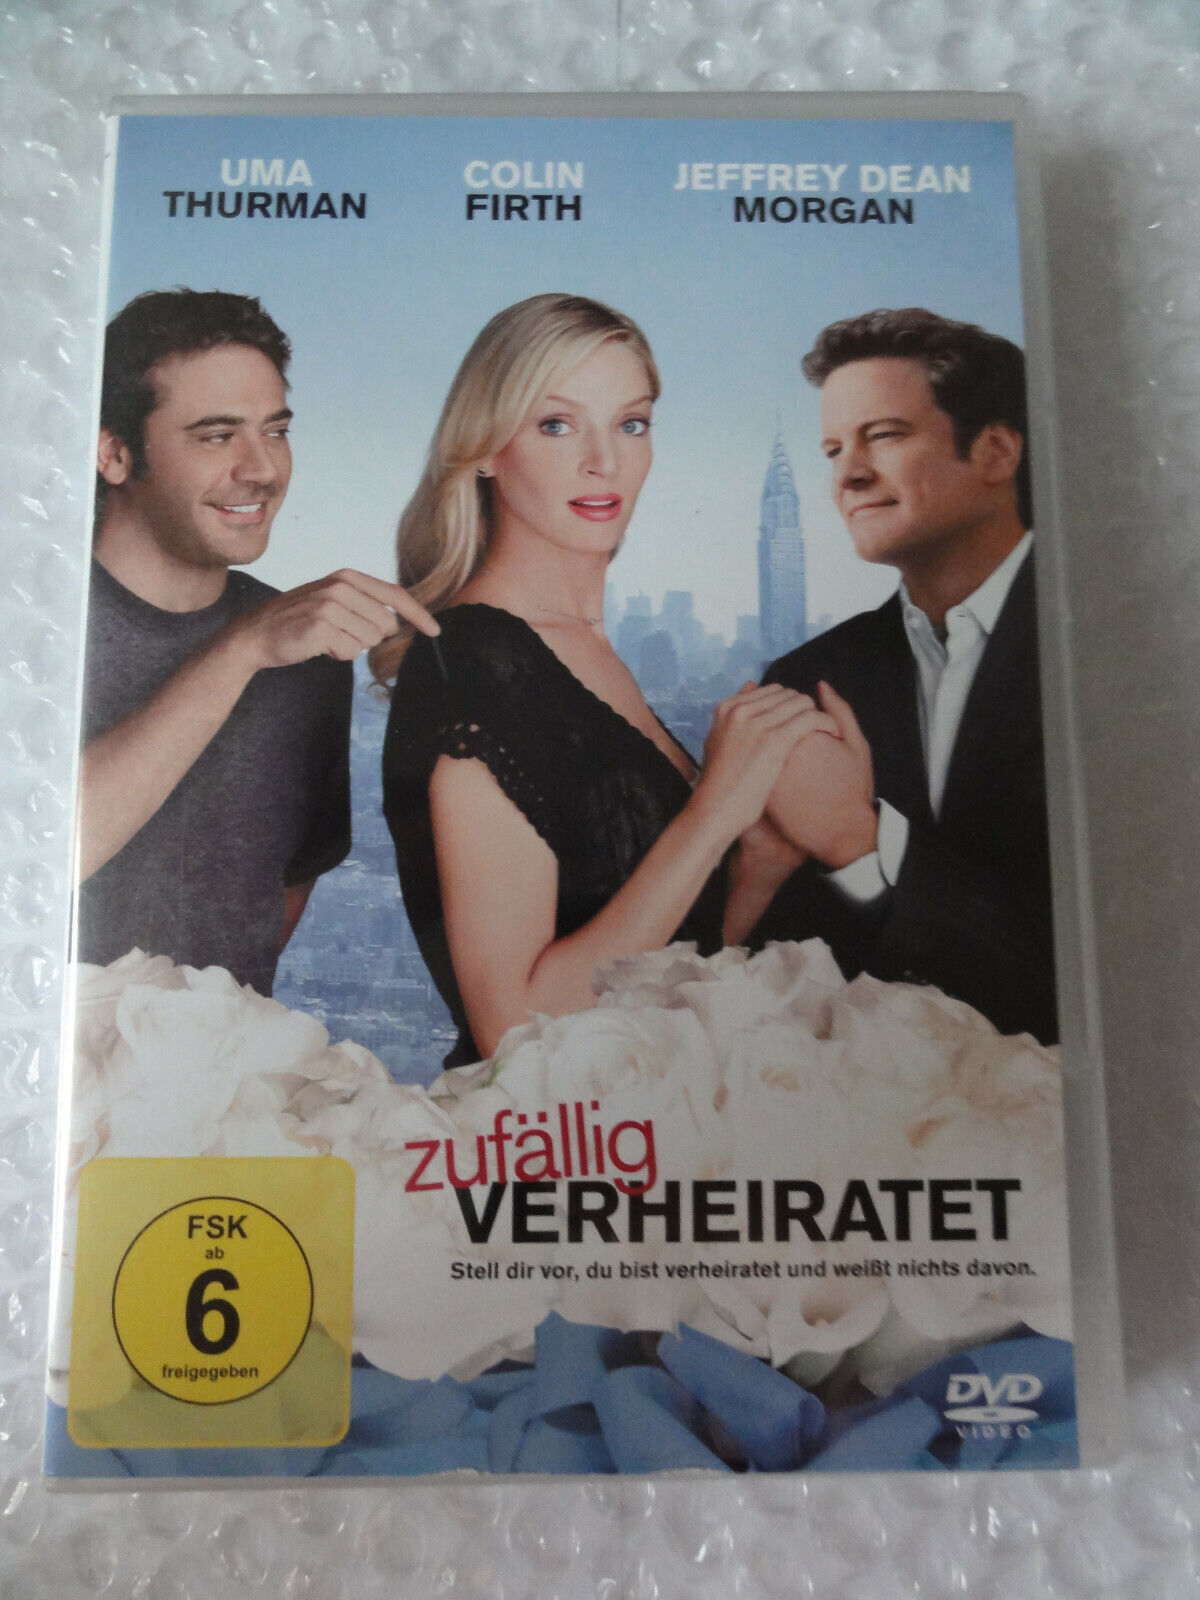 DVD ZUFÄLLIG VERHEIRATET mit Uma Thurman